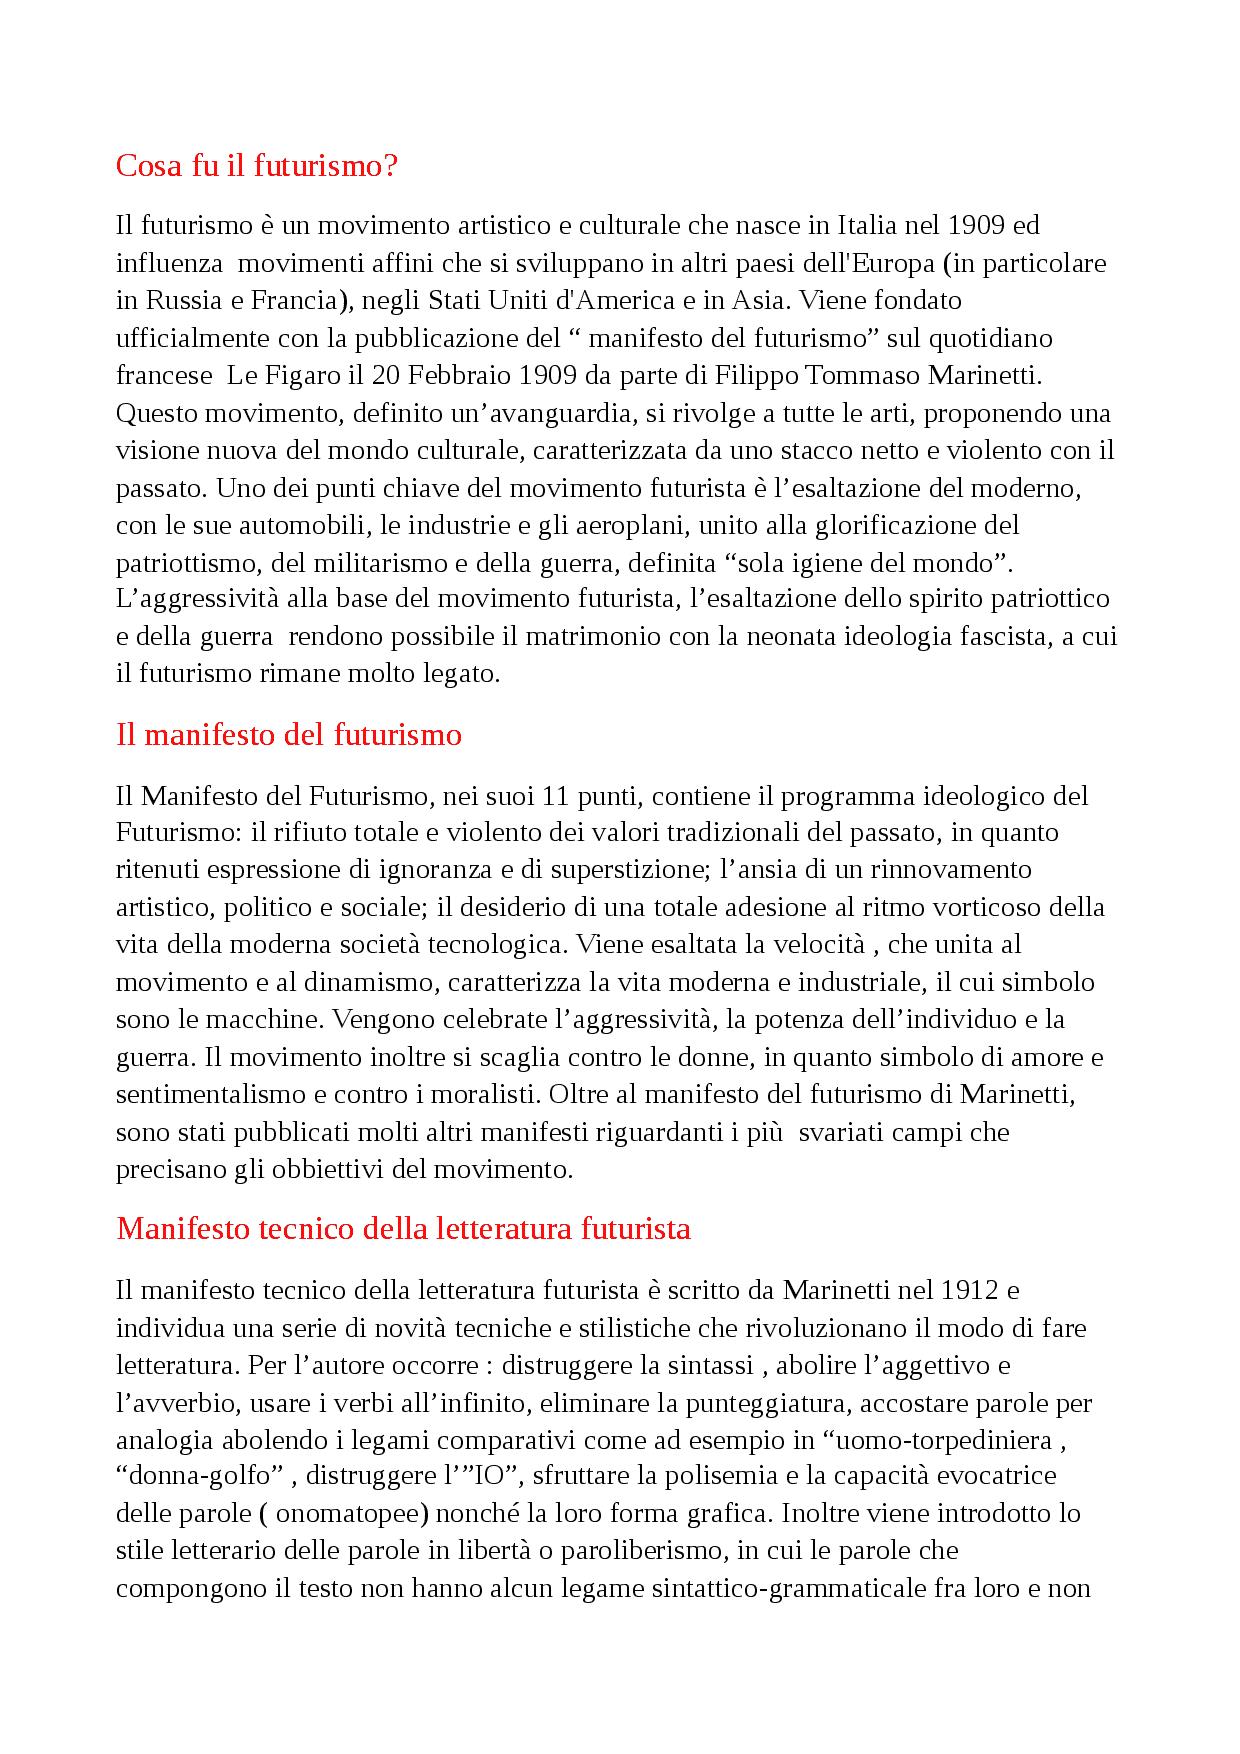 Futurismo, Manifesto Tecnico Del Futurismo , Manifesto encequiconcerne Docsity